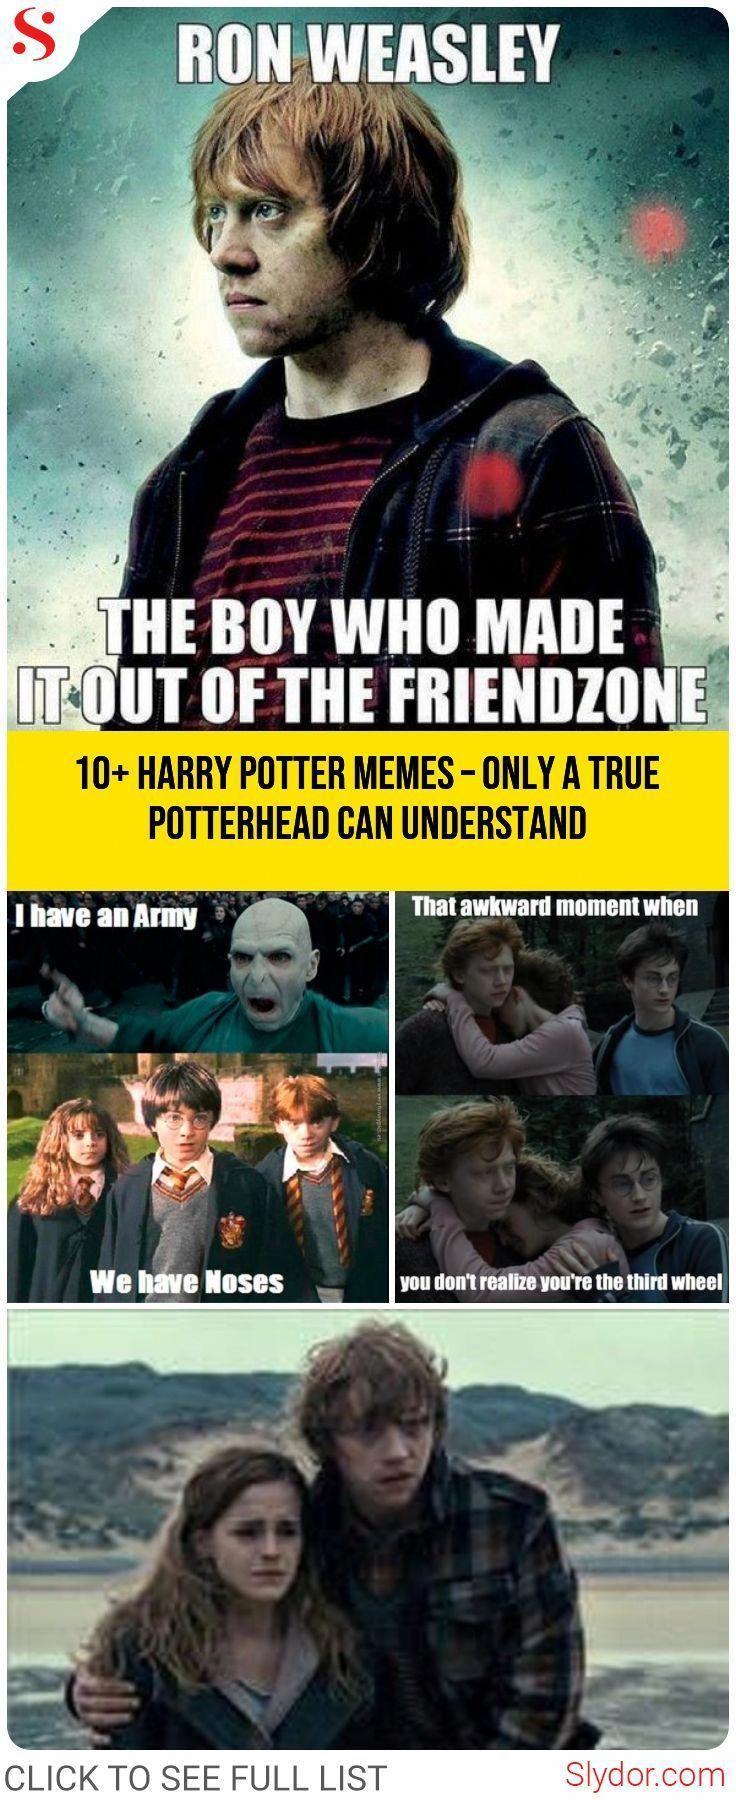 Harry Potter Memes Only A True Potterhead Can Understand Part 2 Harrypotter Funnymemes Lmao Pott Harry Potter Memes Harry Potter Harry Potter Universal